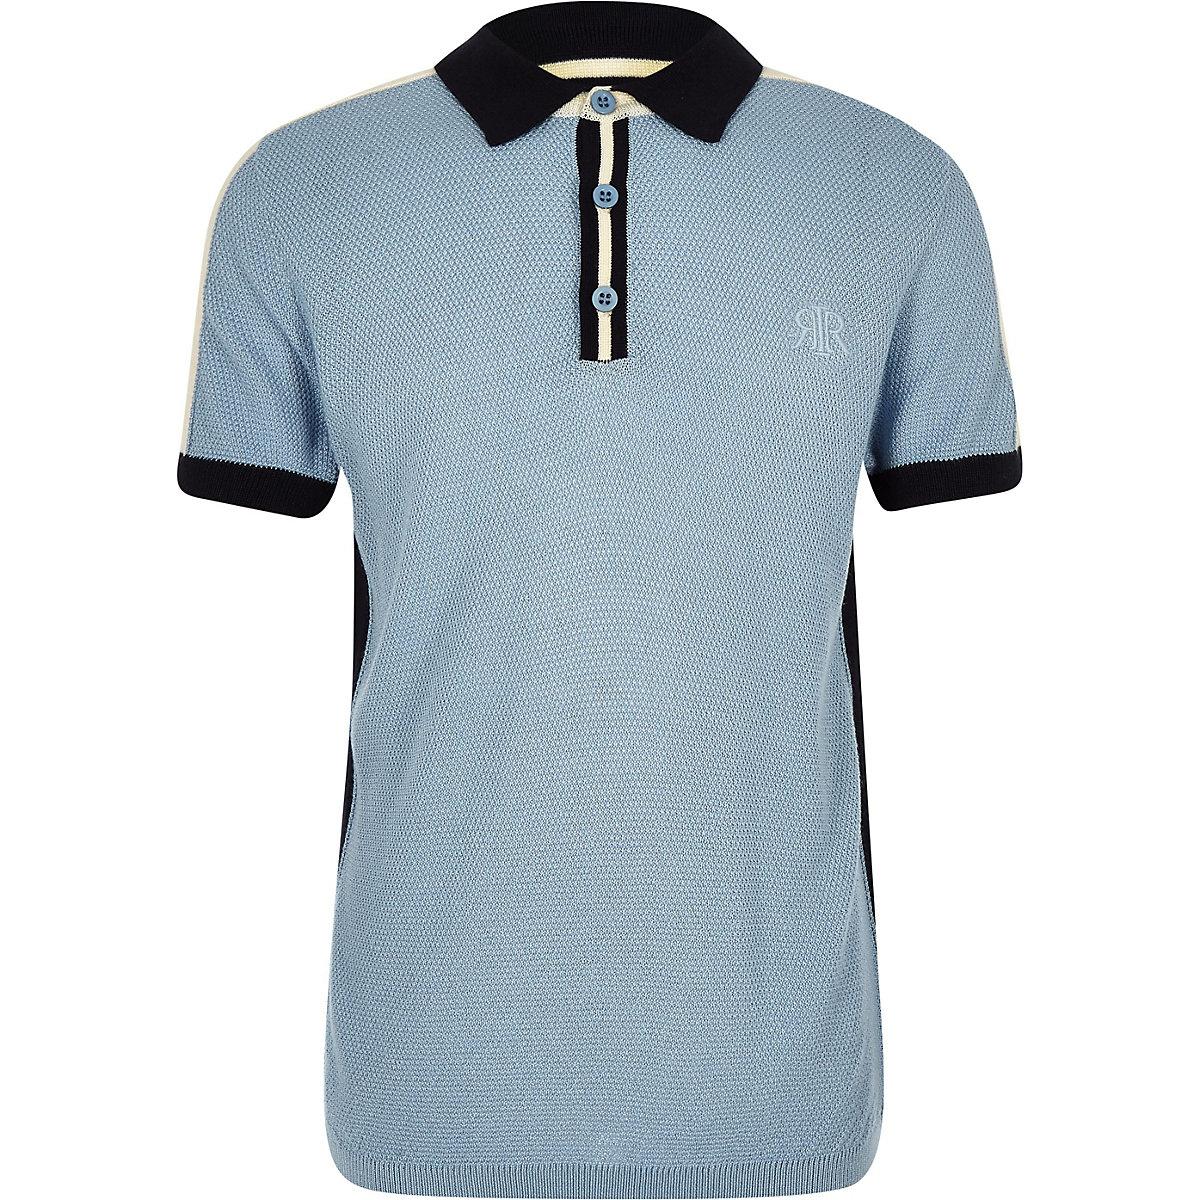 Boys blue block knit polo shirt